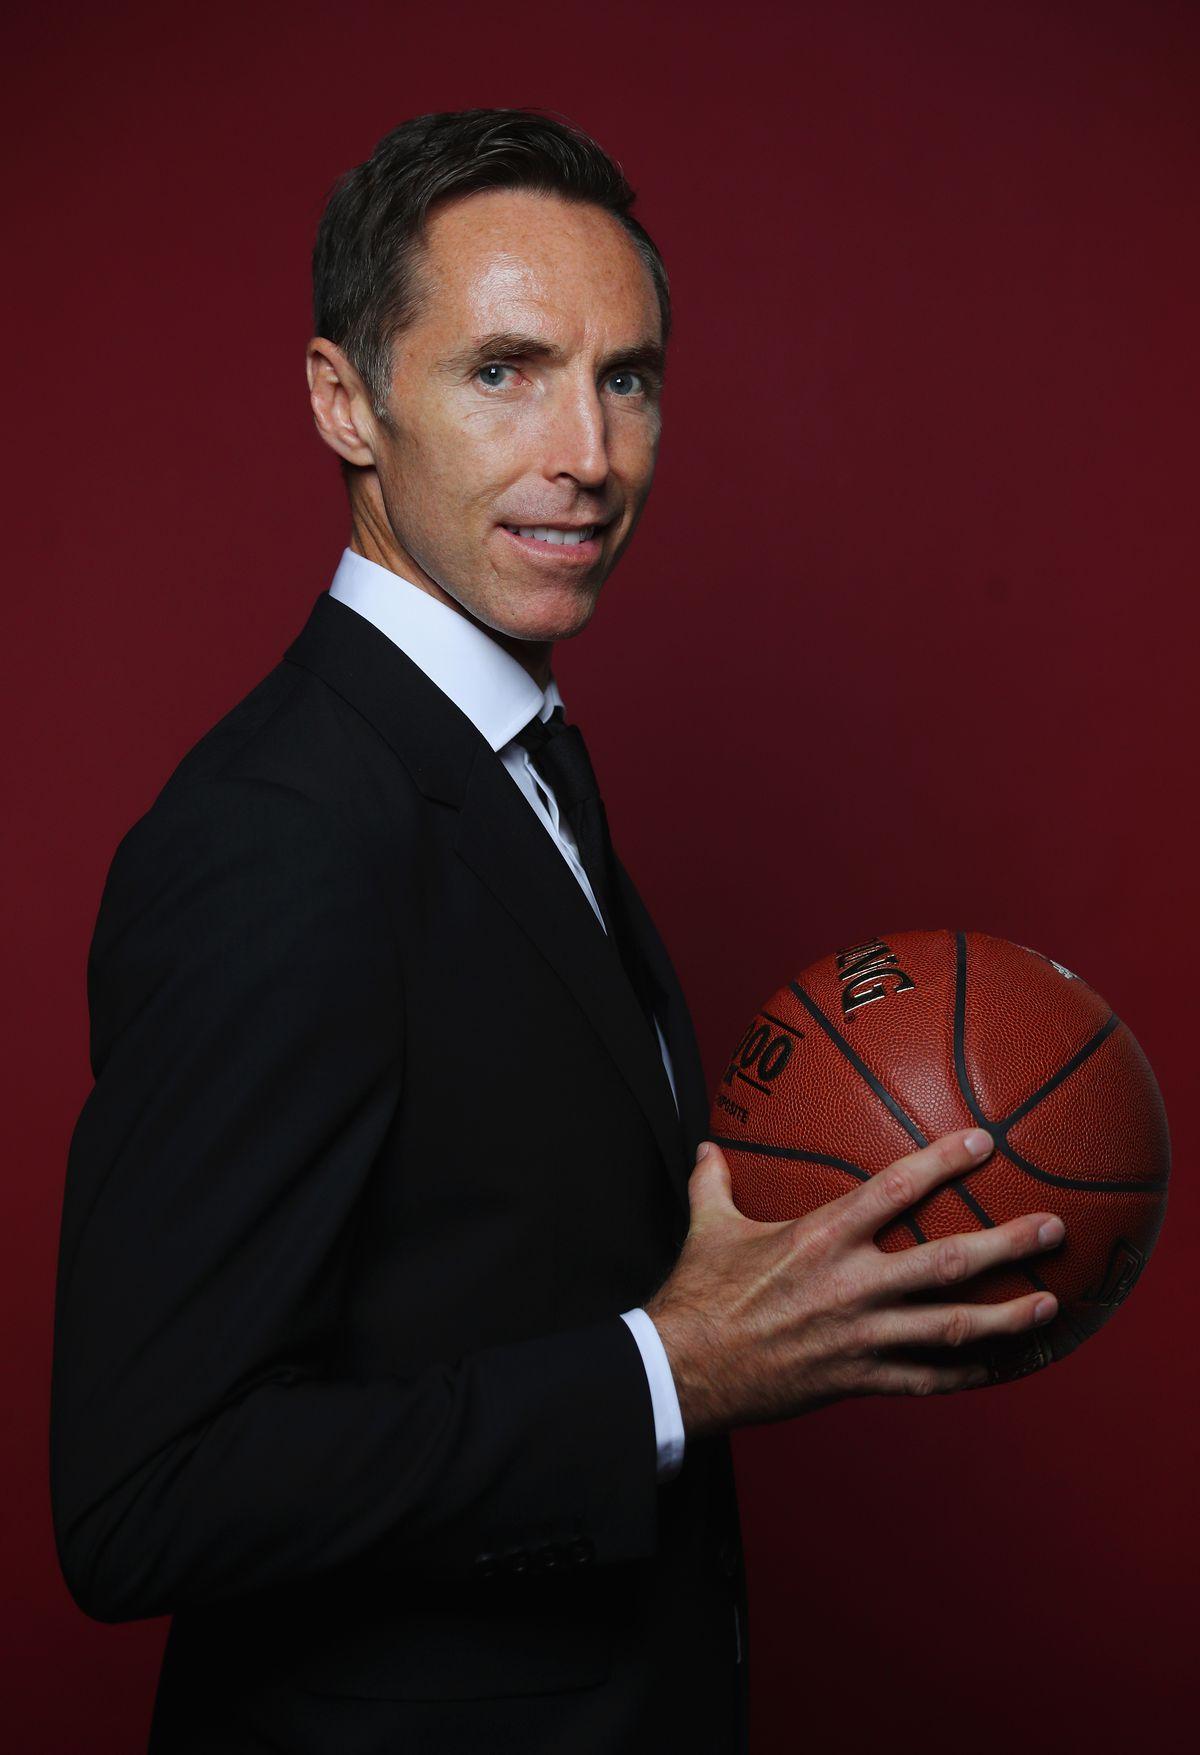 2018 Basketball Hall of Fame Enshrinement Ceremony - Portraits